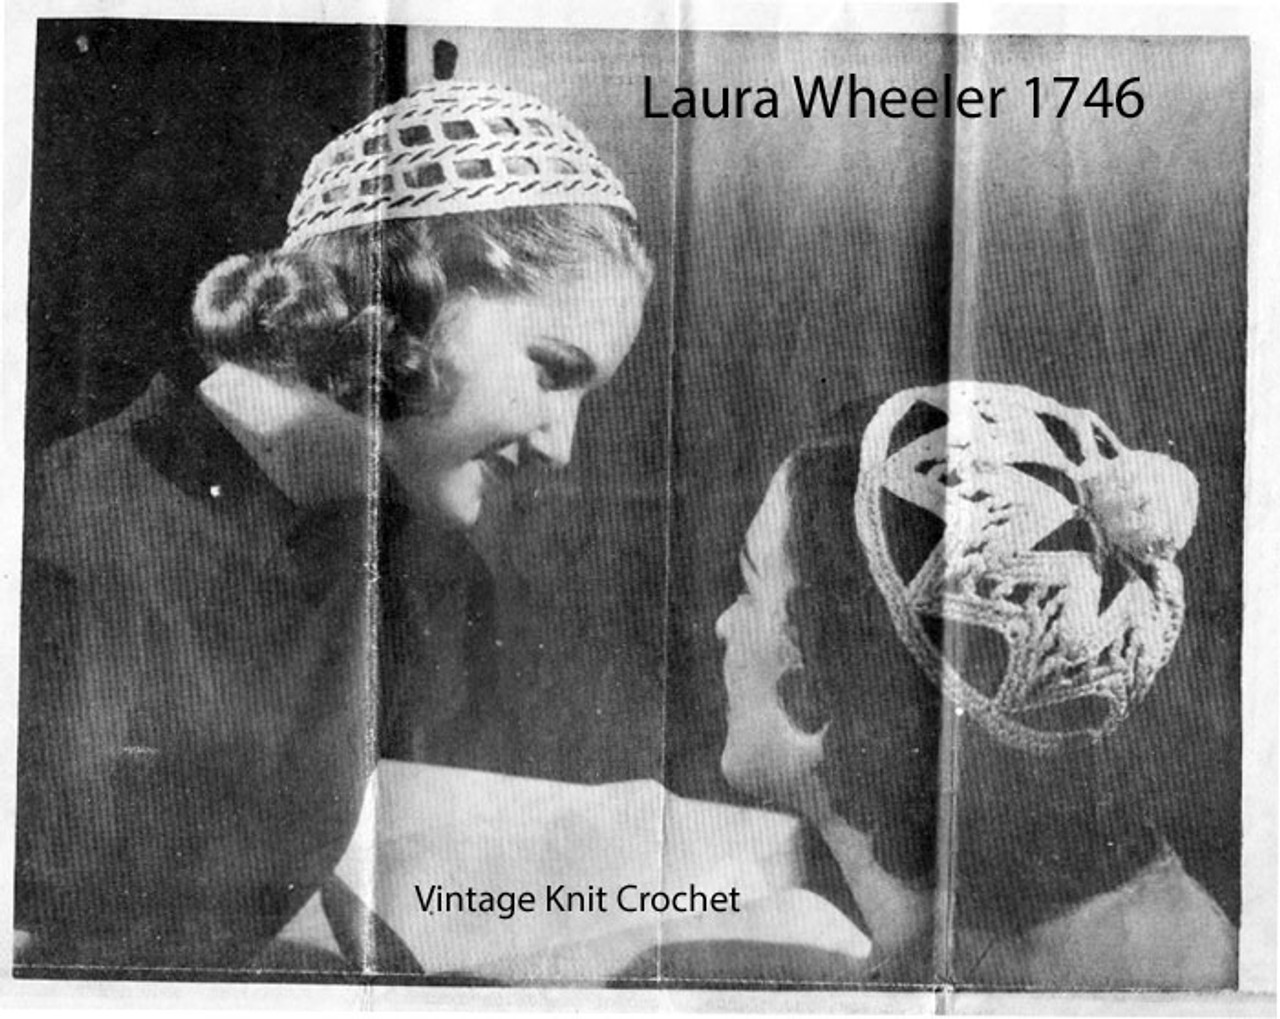 Vintage Beanie Caps Crochet Pattern, Mail Order 1746